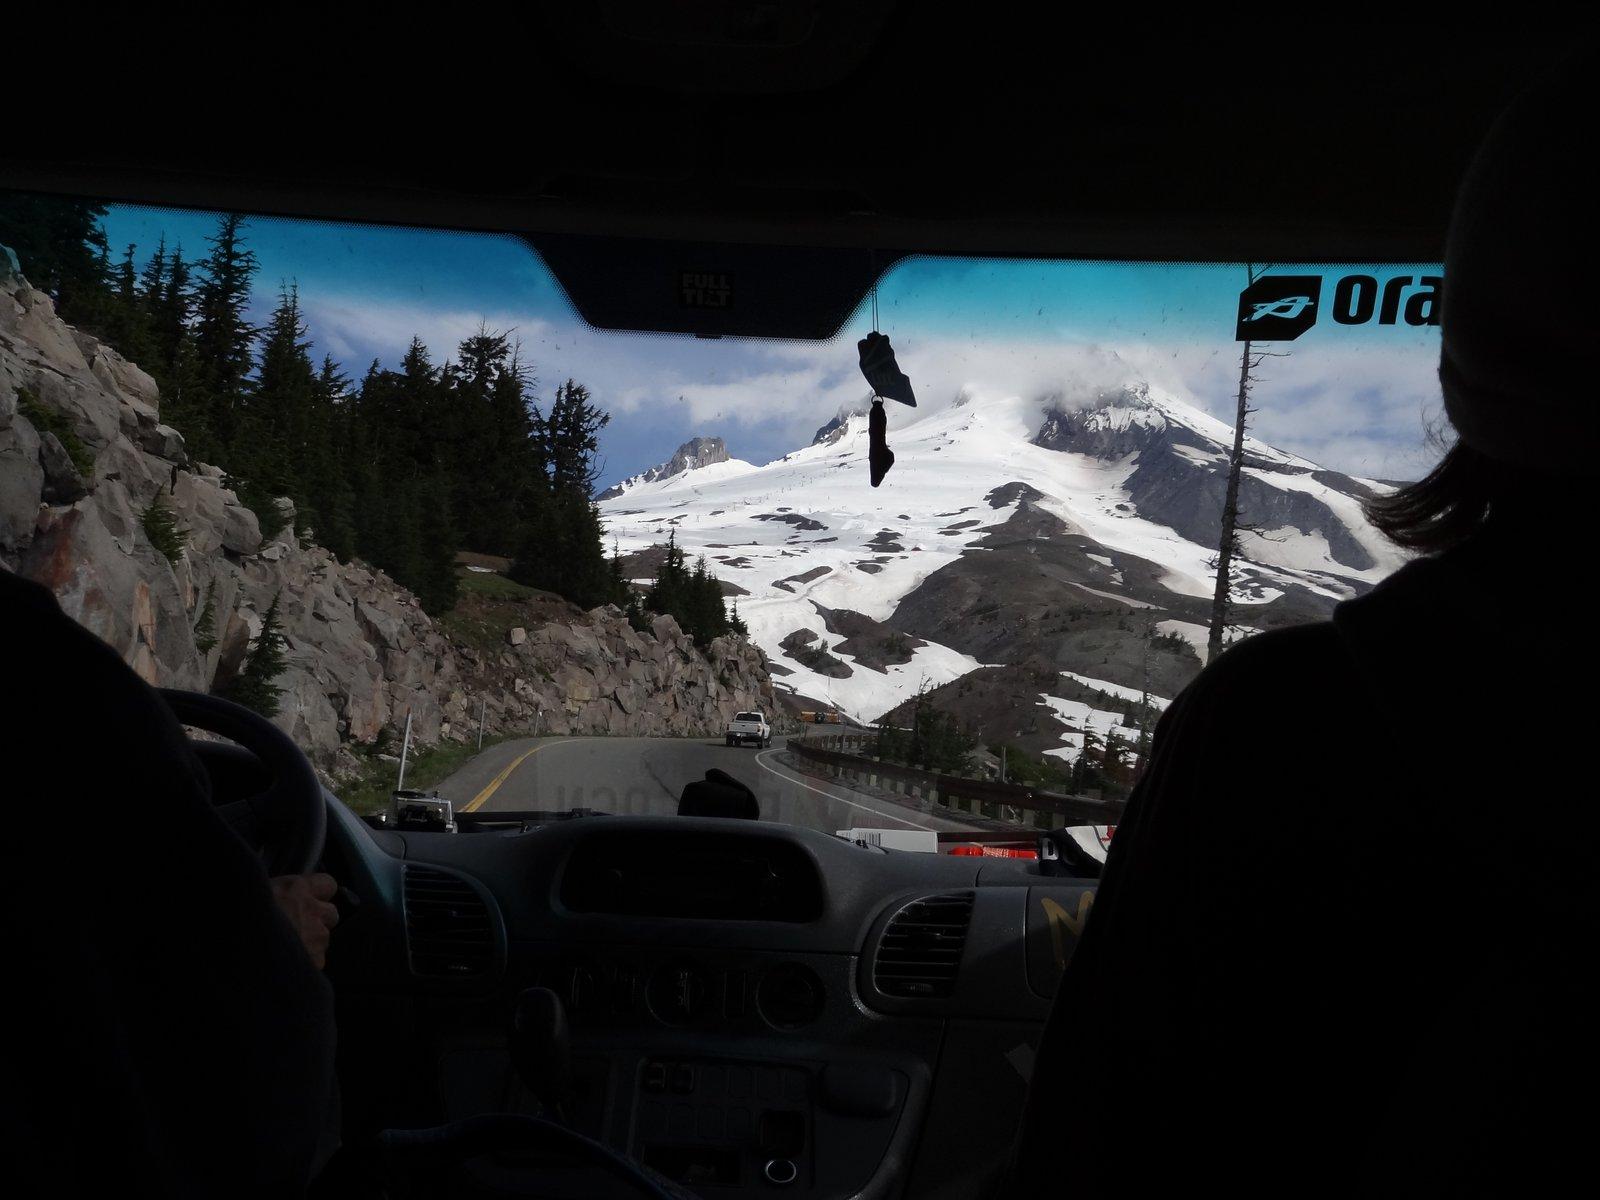 On the Way to hood